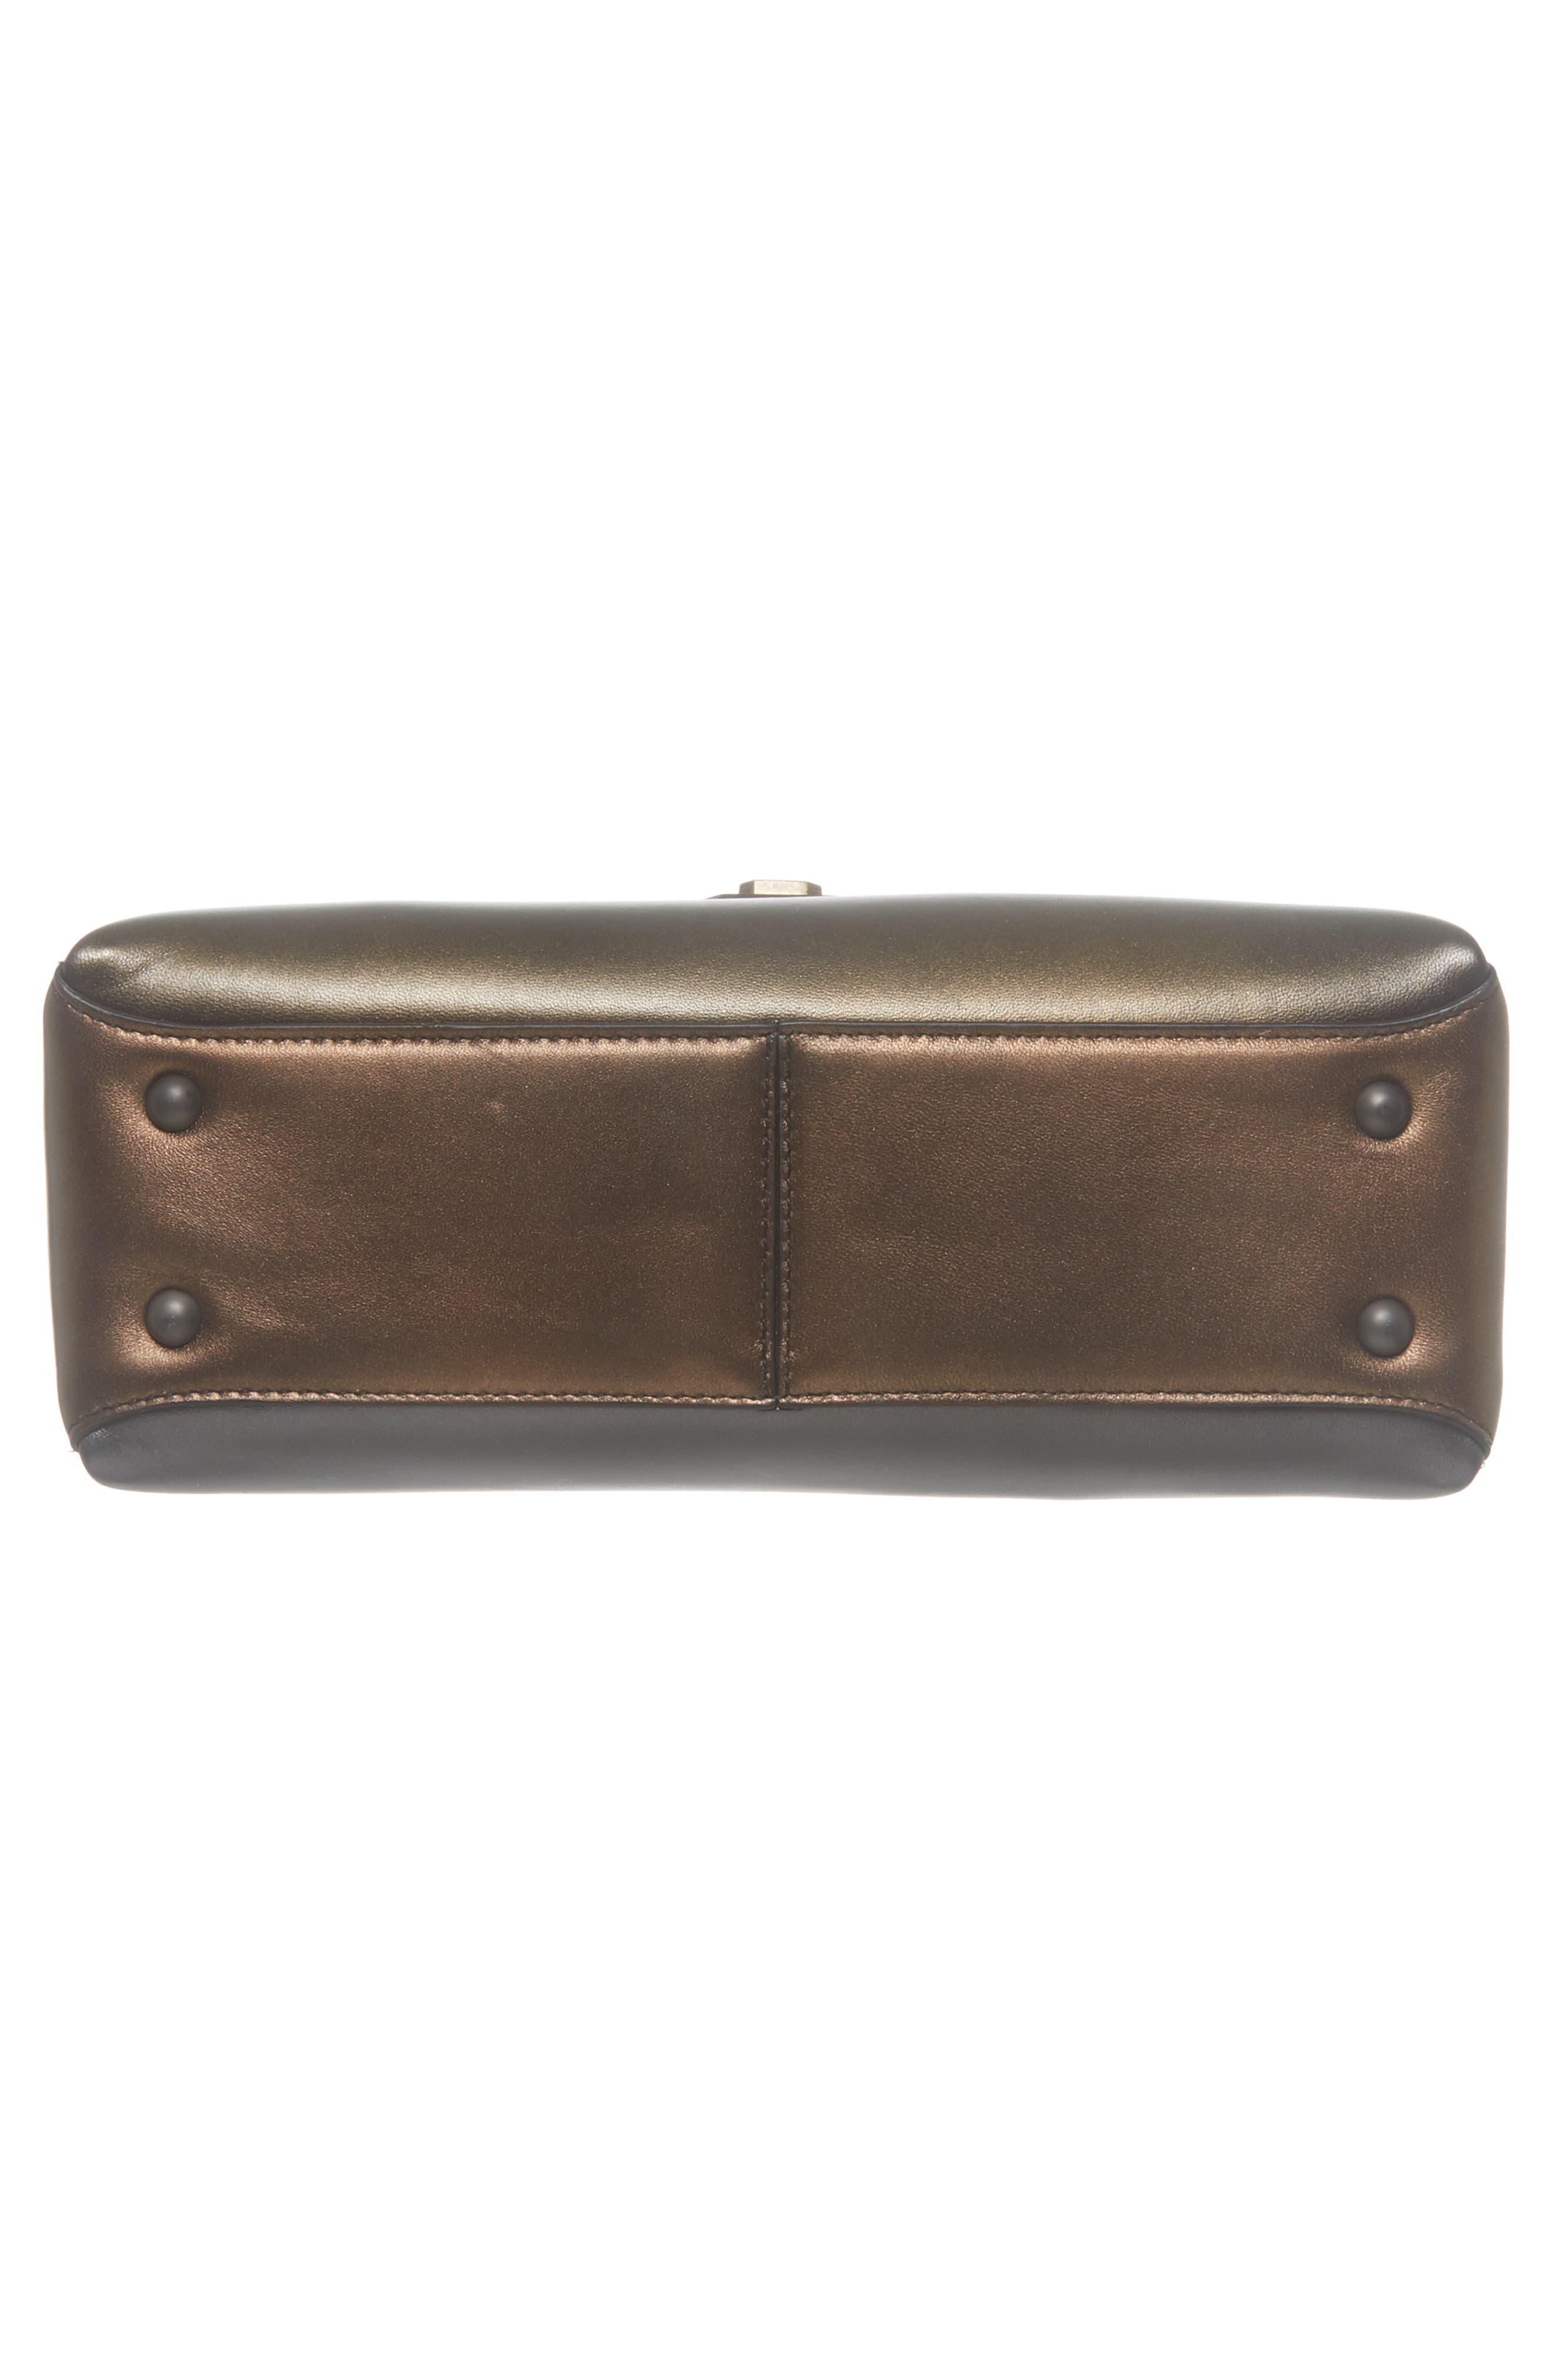 Small Piazza Tricolor Metallic Leather Handbag,                             Alternate thumbnail 6, color,                             DARK GOLD MULTI